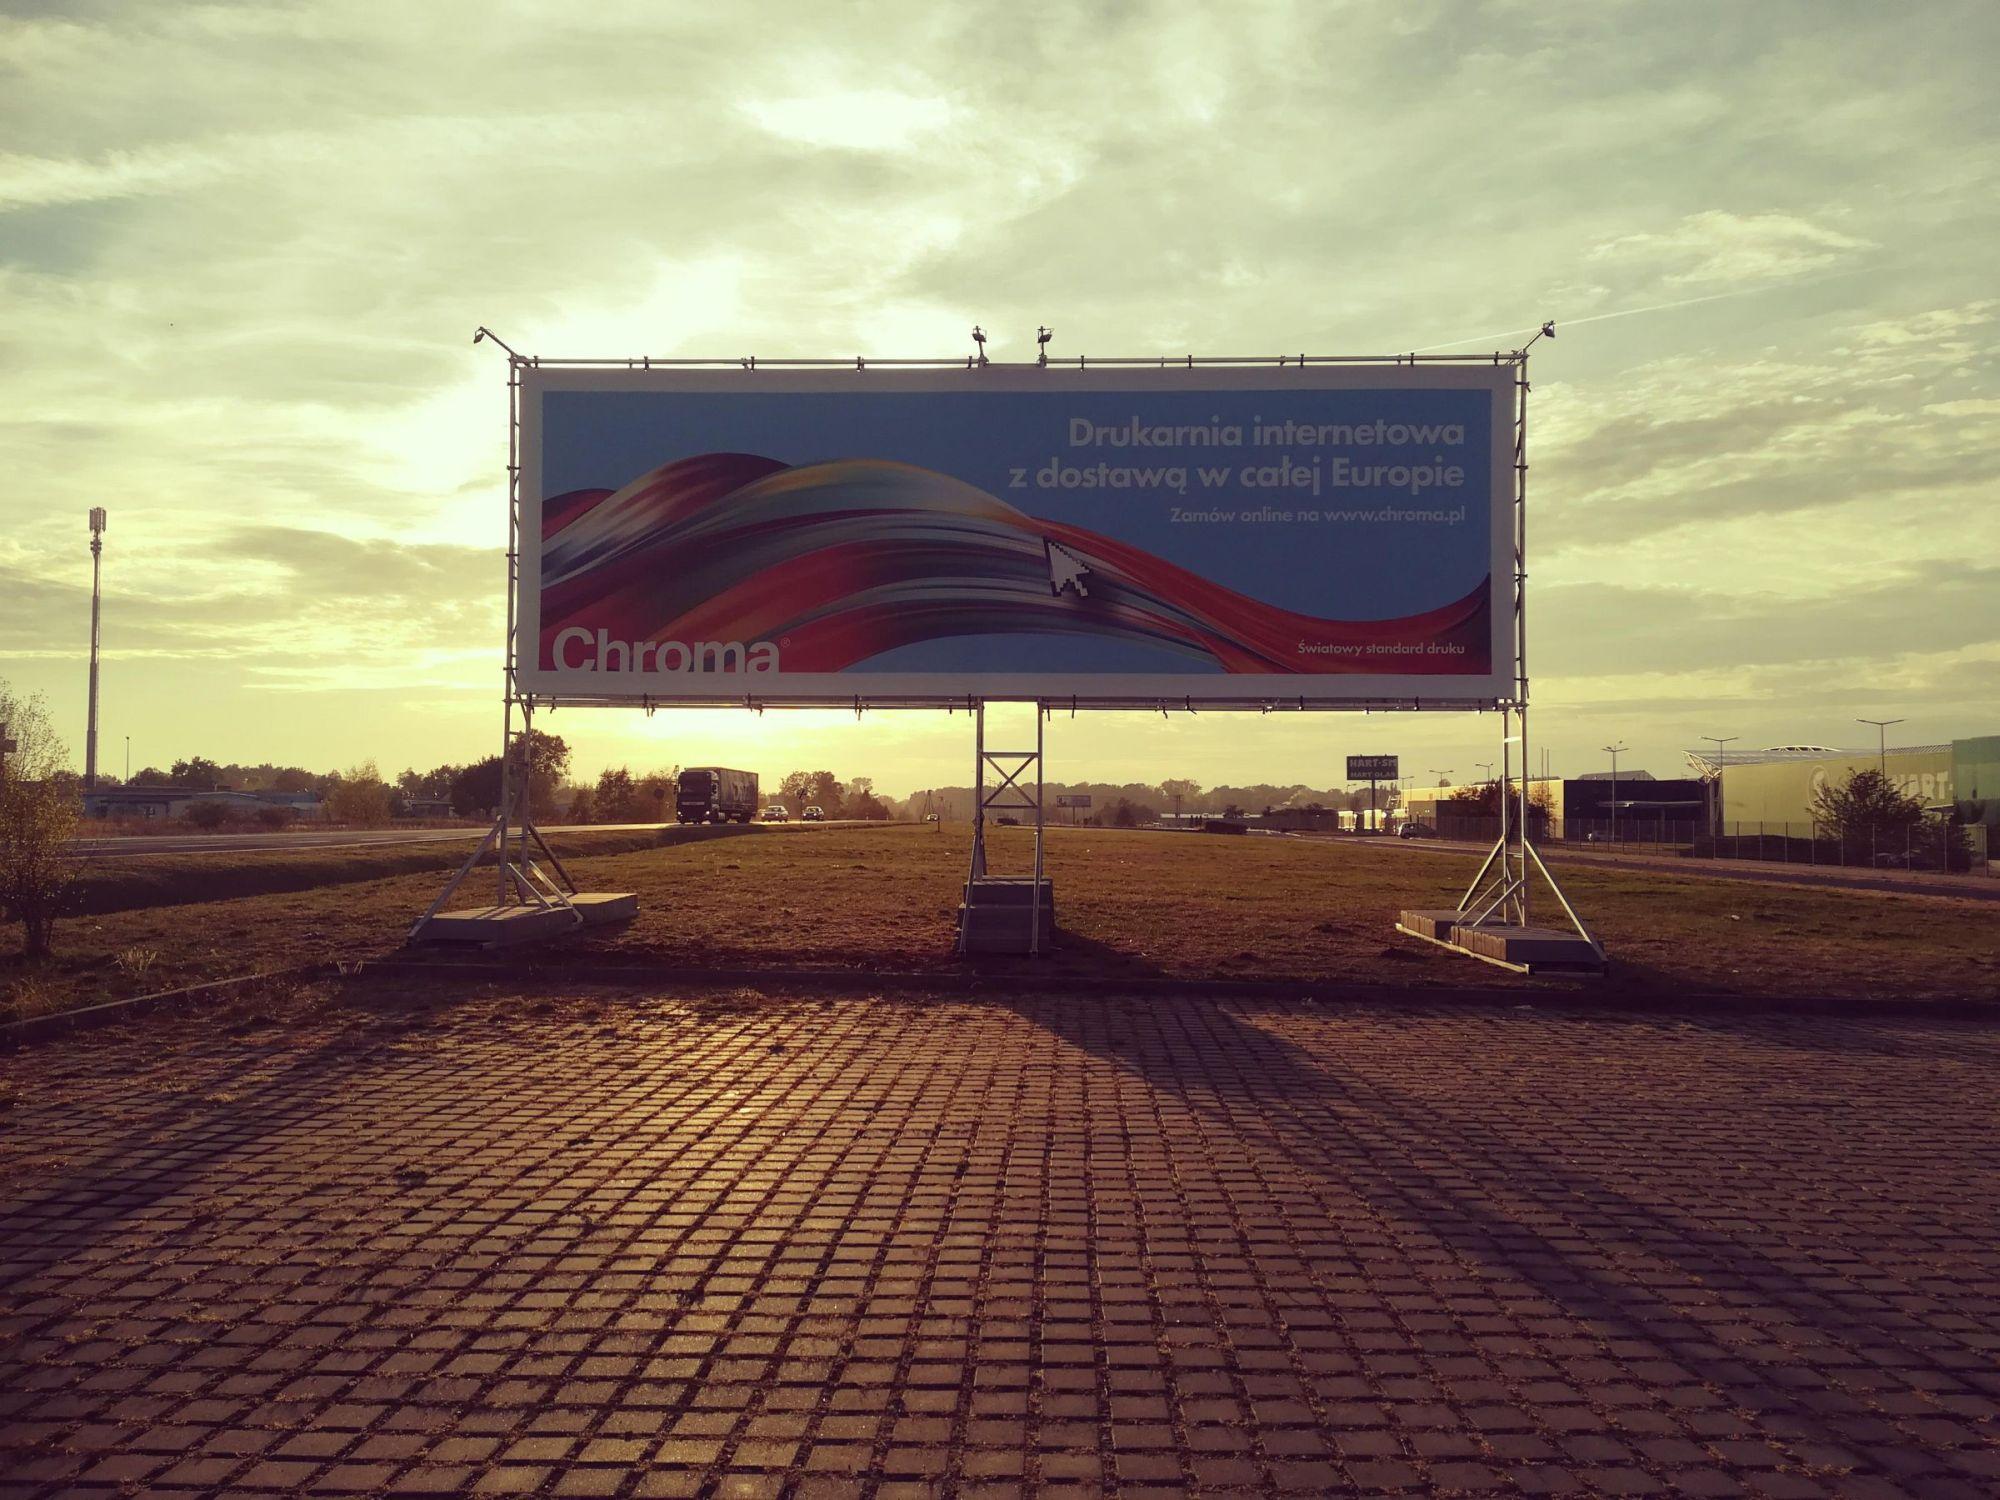 Billboard reklamowy Chroma